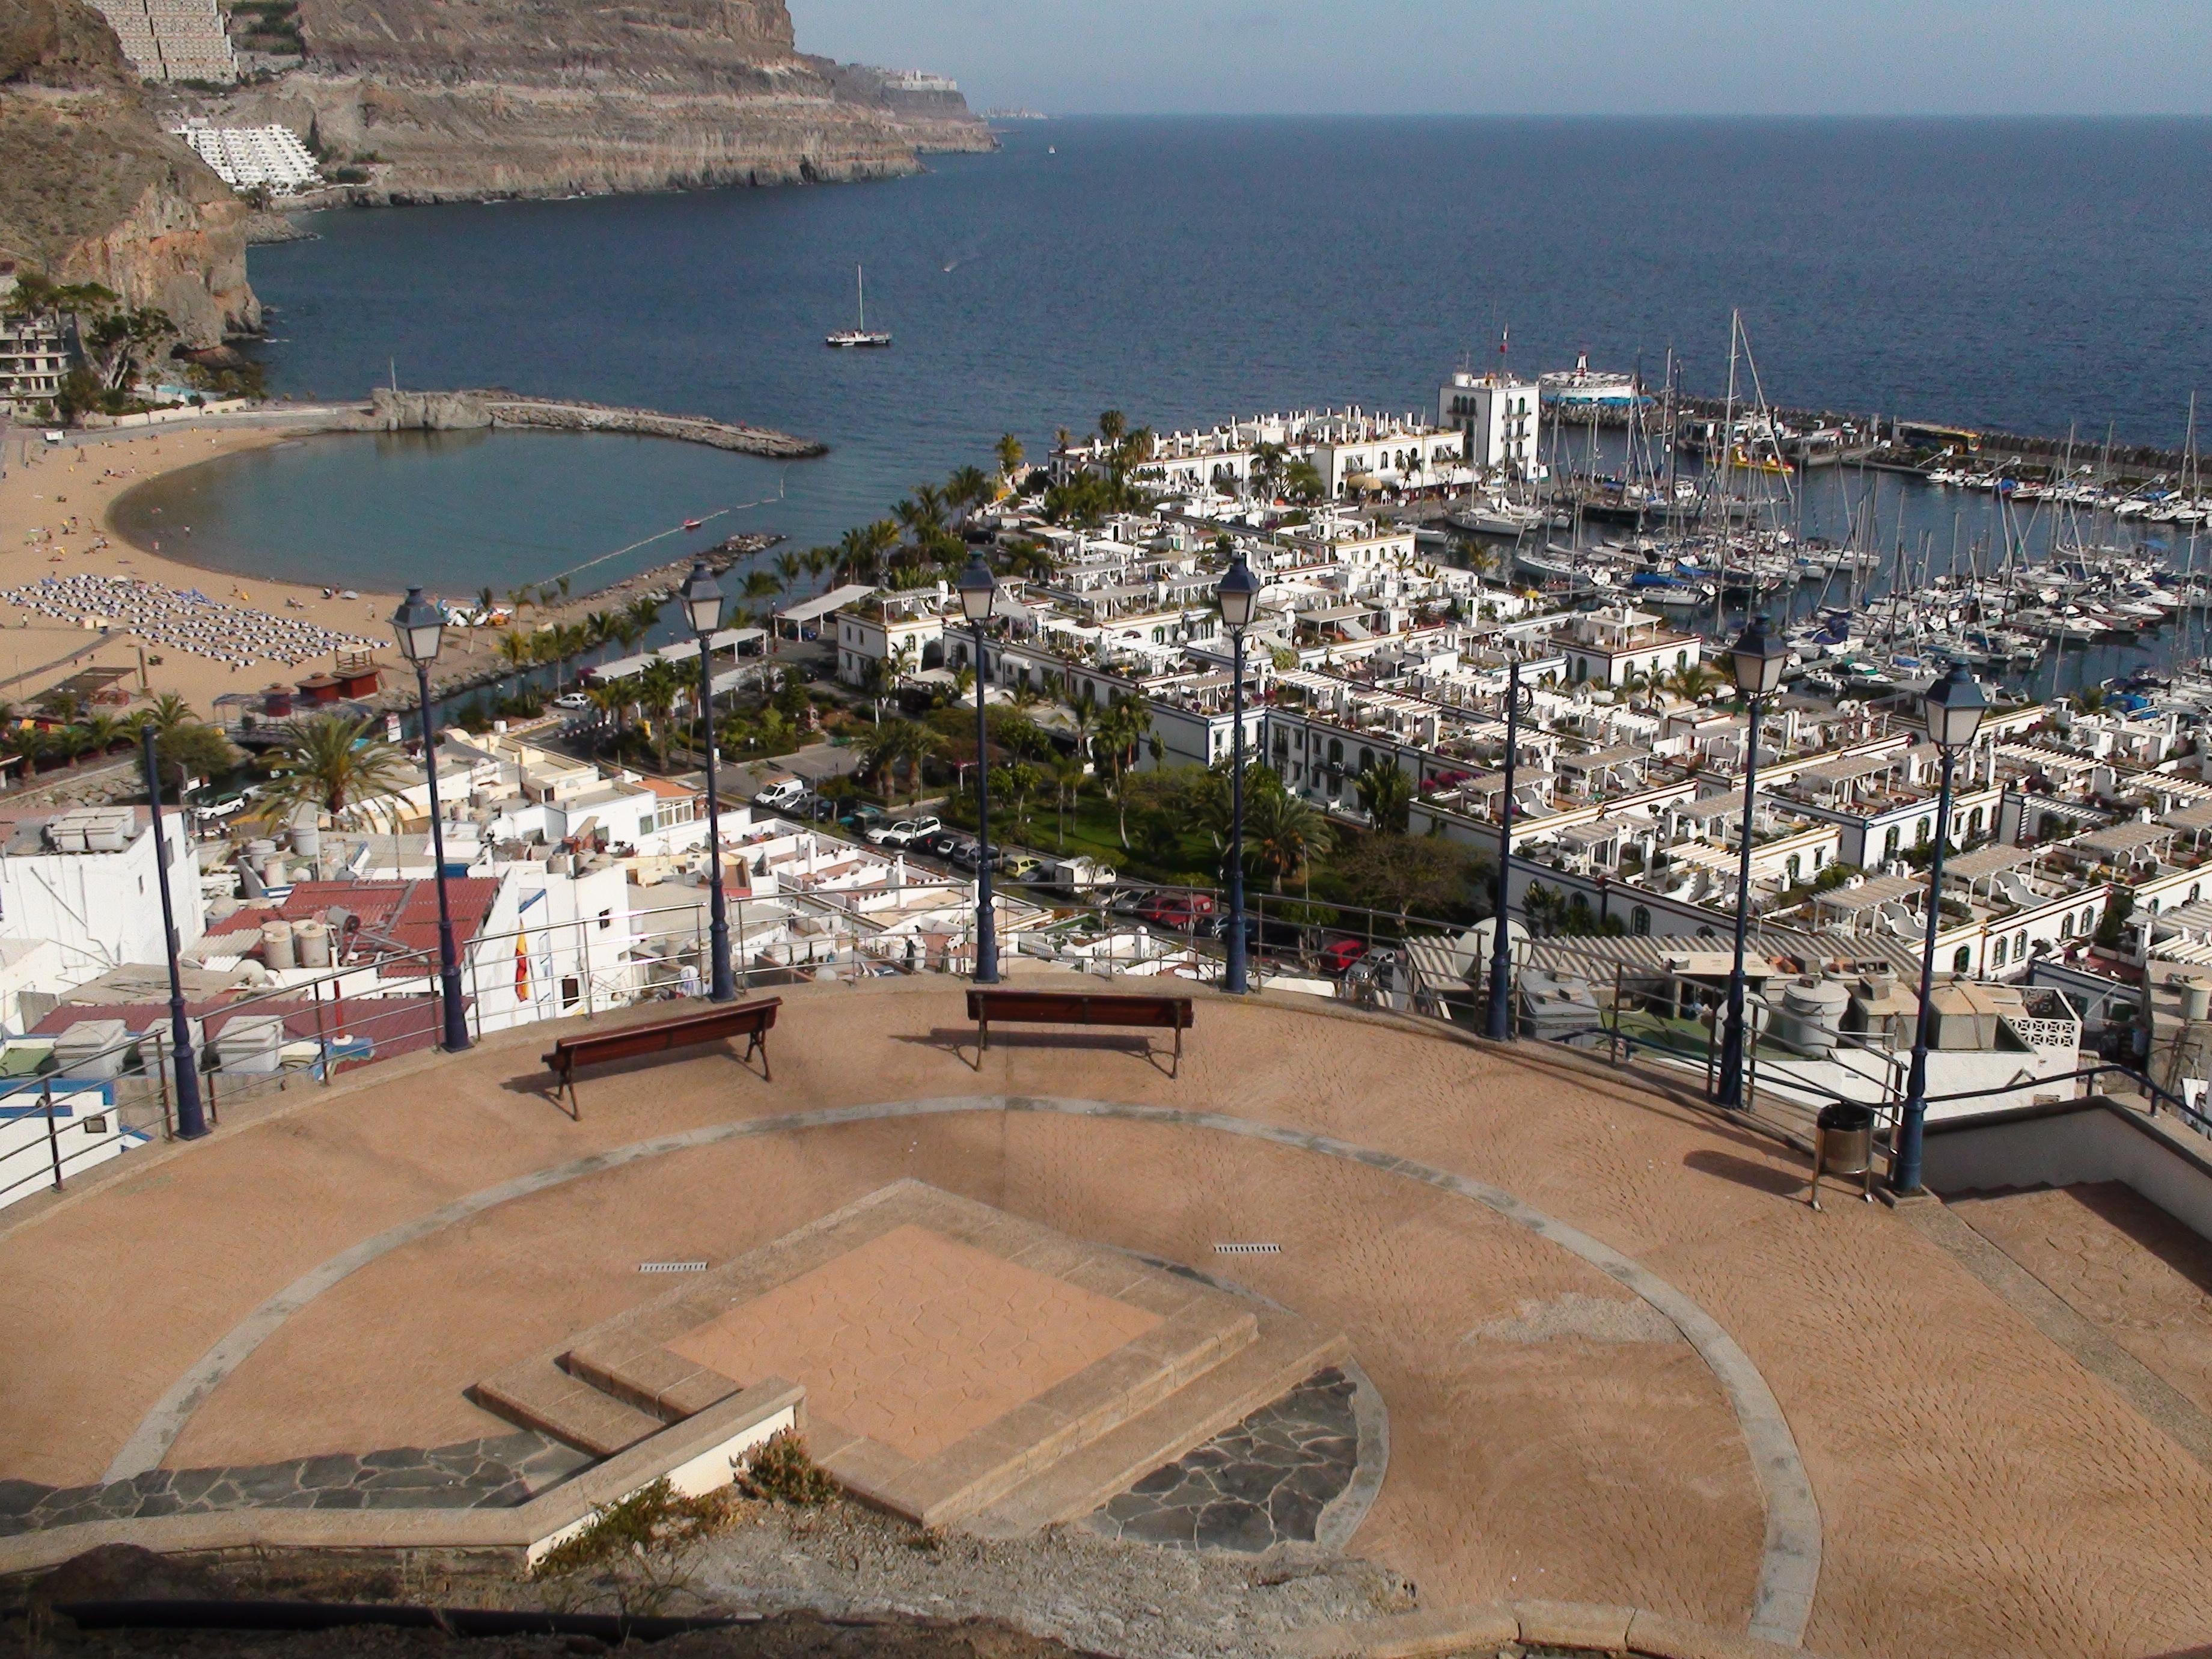 Activities - Marina apartments puerto de mogan ...